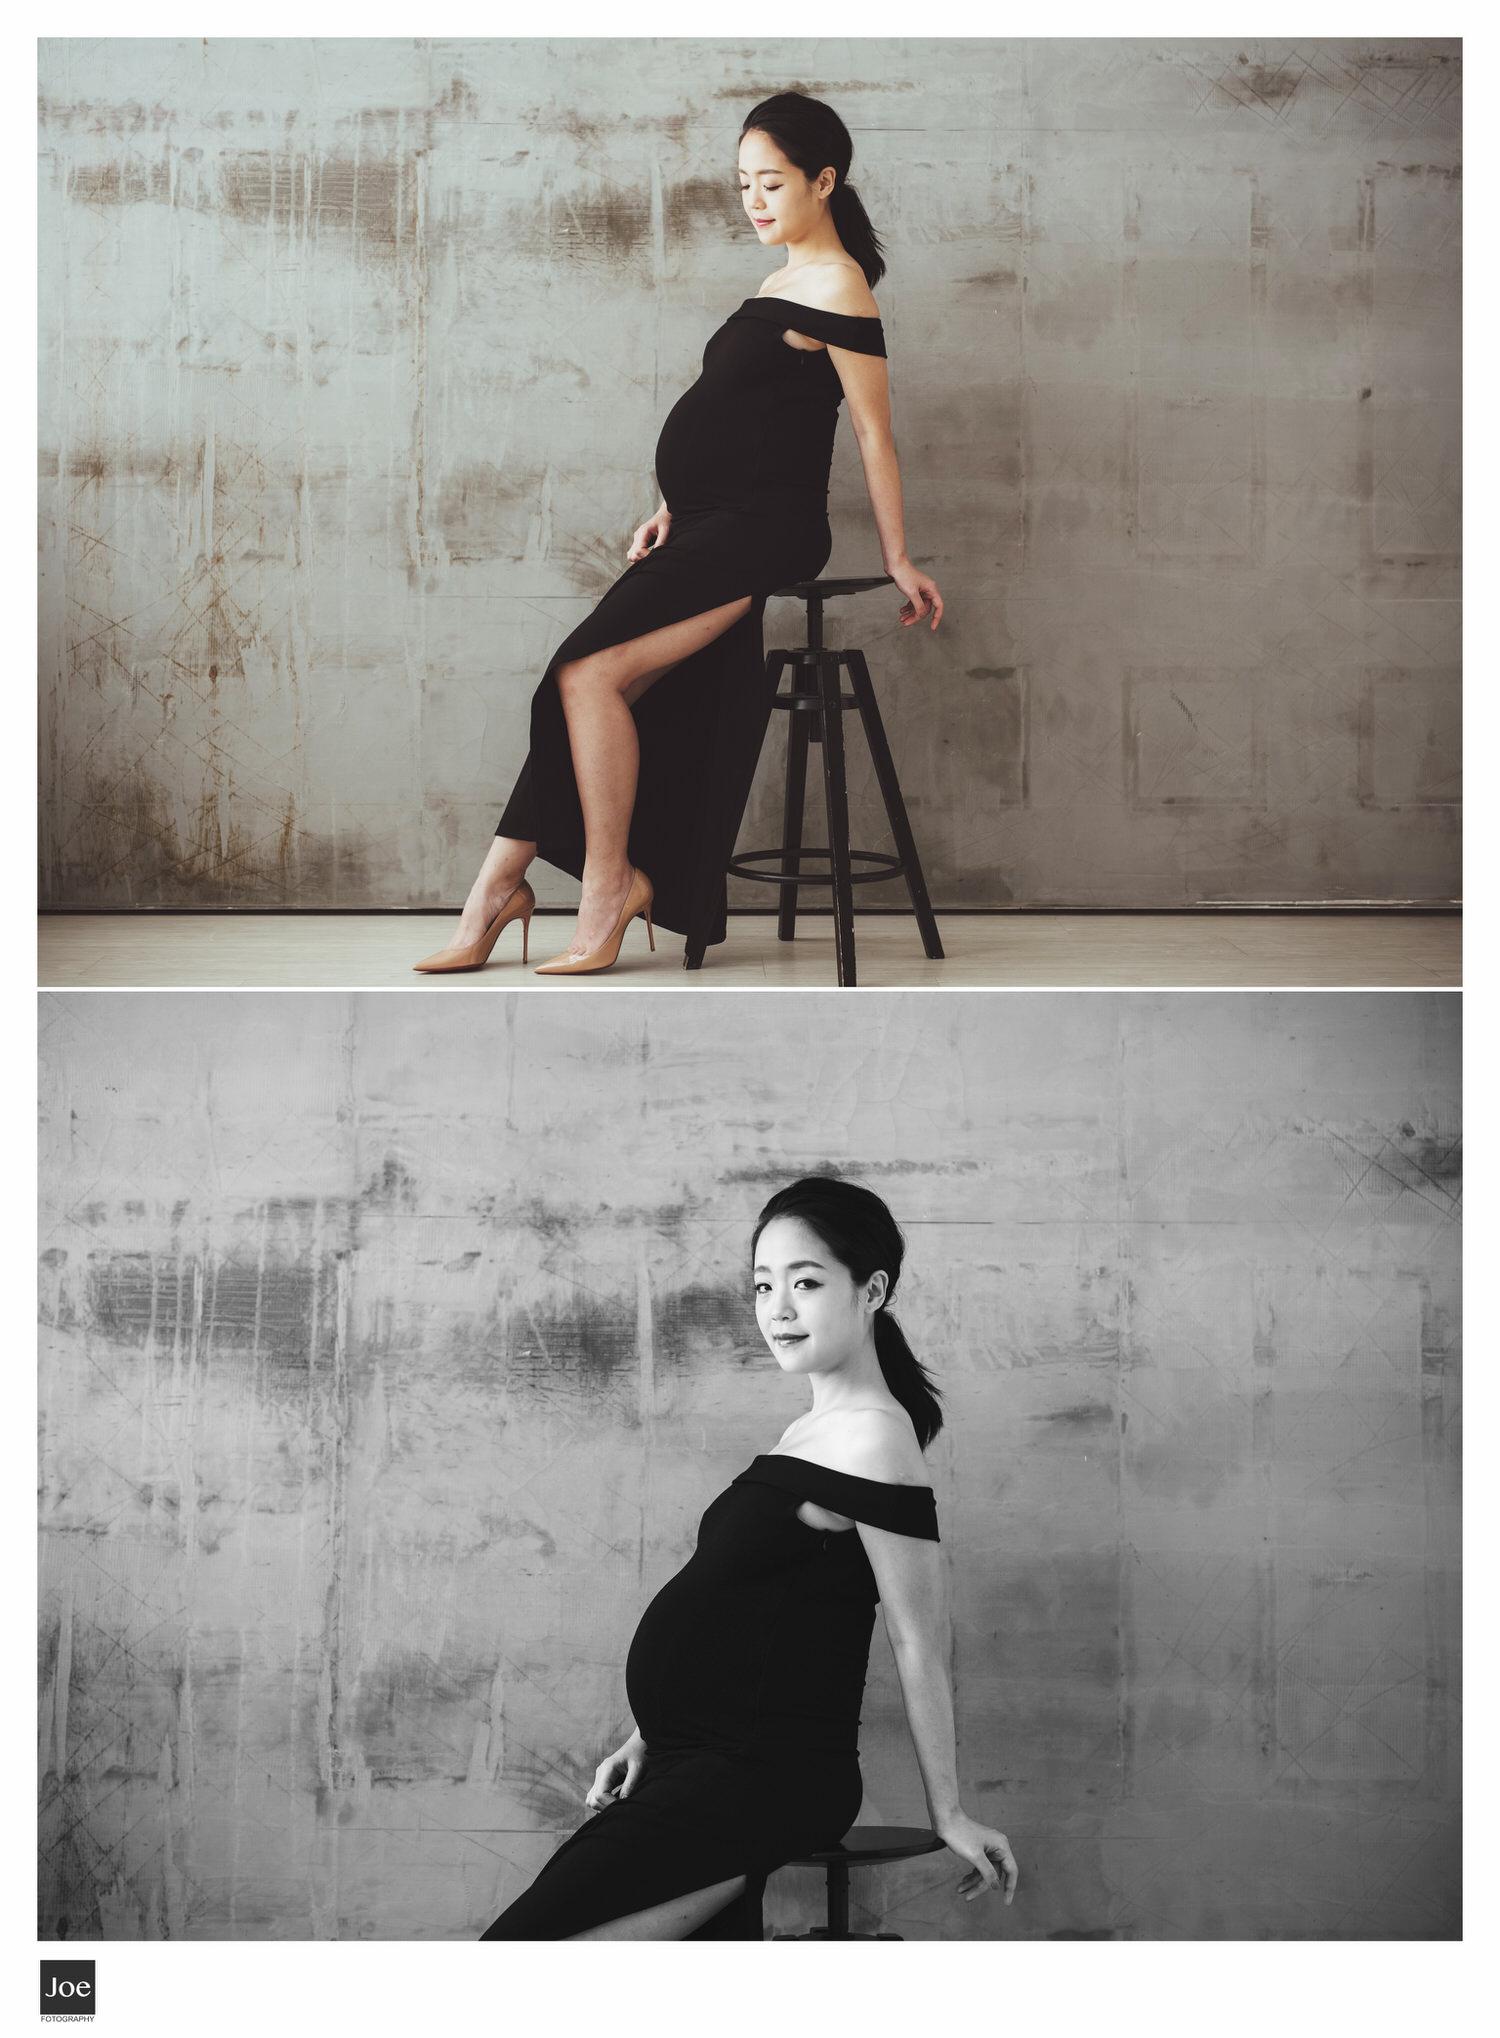 joe-fotography-maternity-photo-rayne-19.jpg